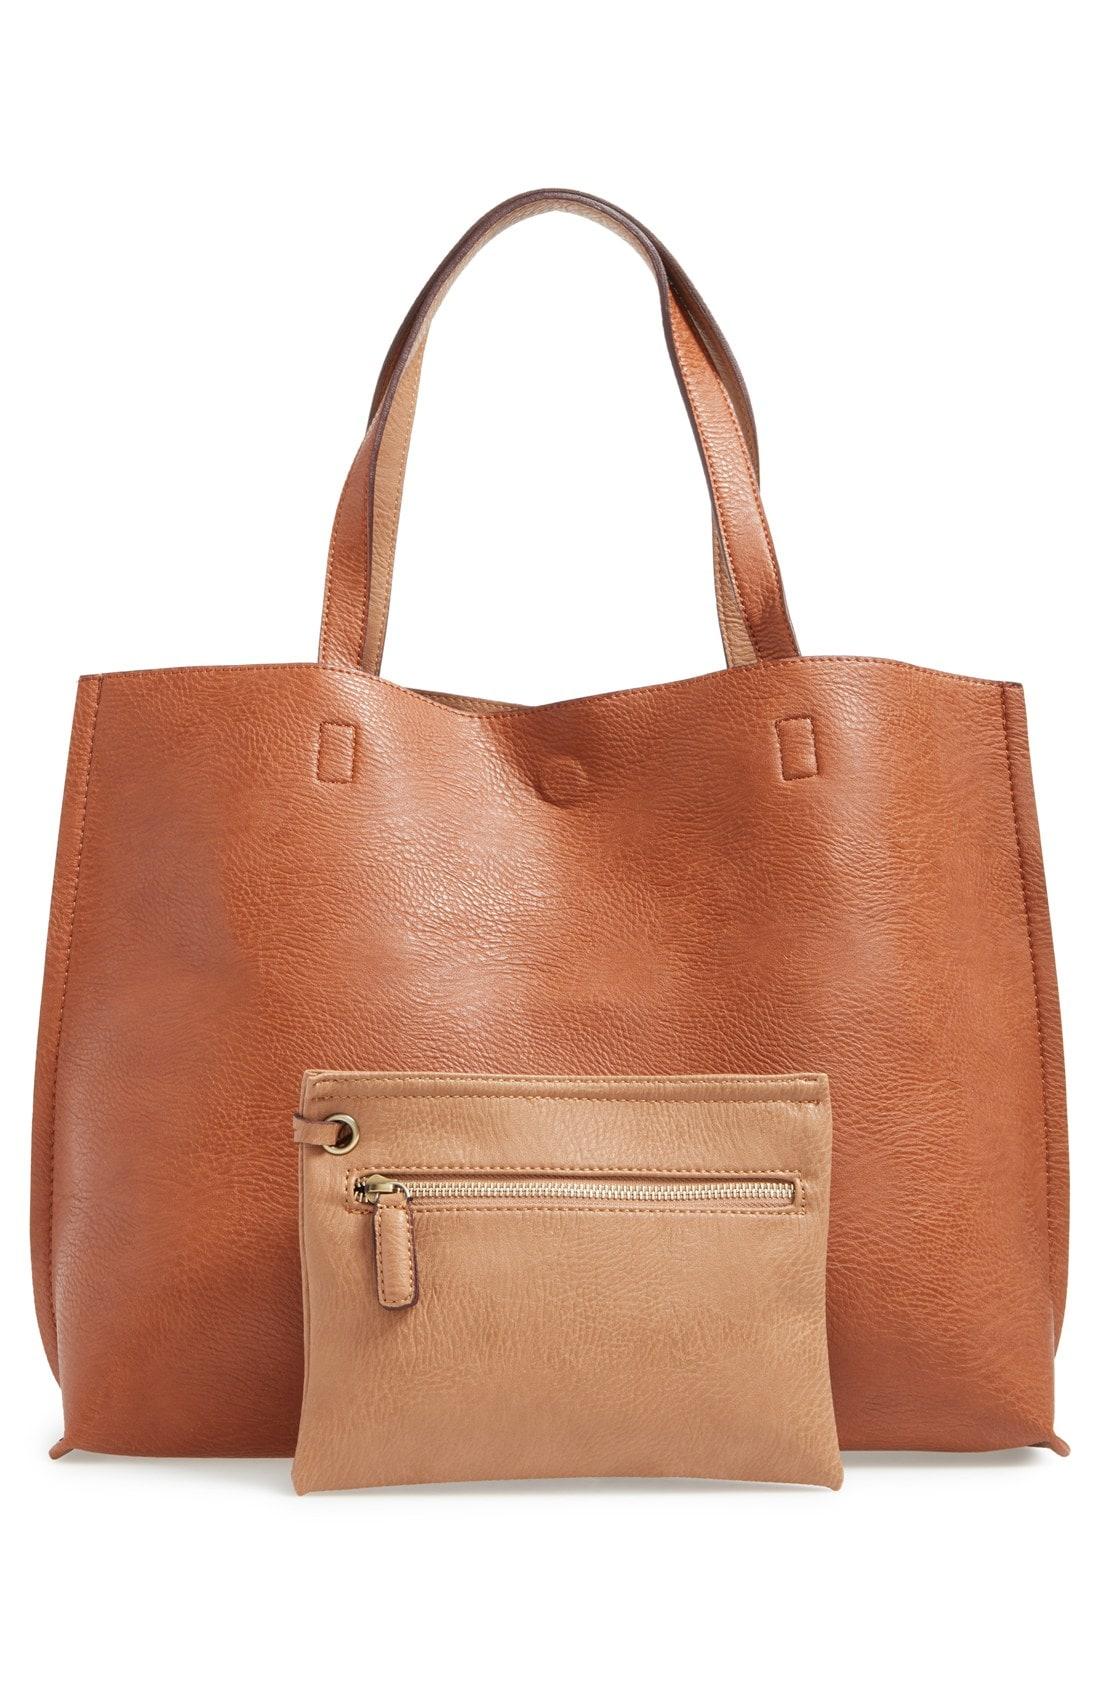 Handbags & Wallets for Women | Nordstrom